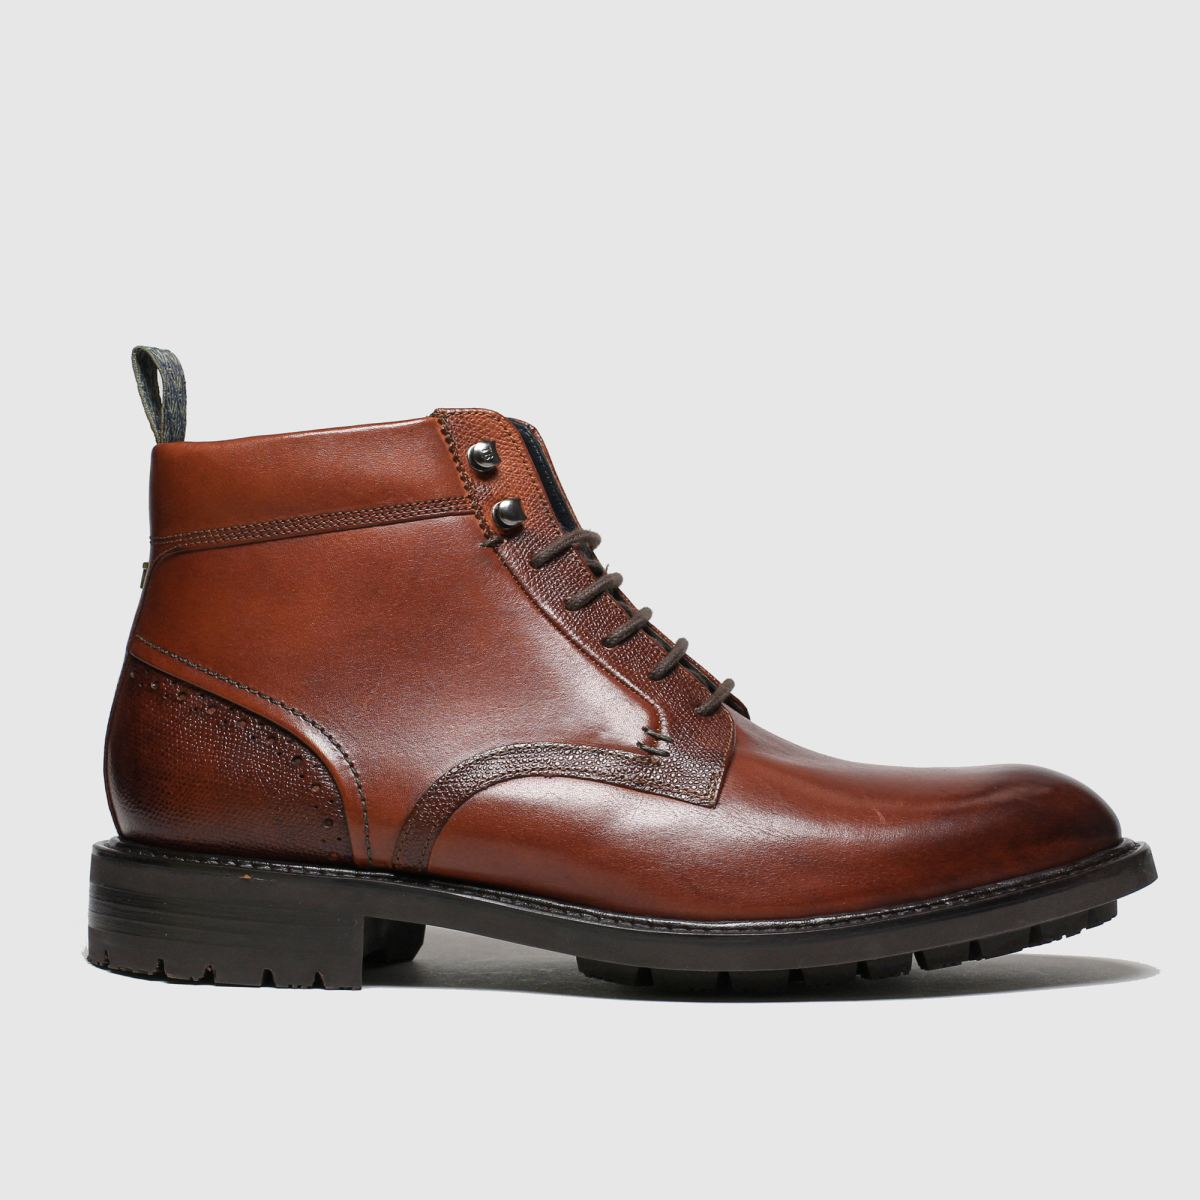 Ted Baker Tan Wottsn Boots